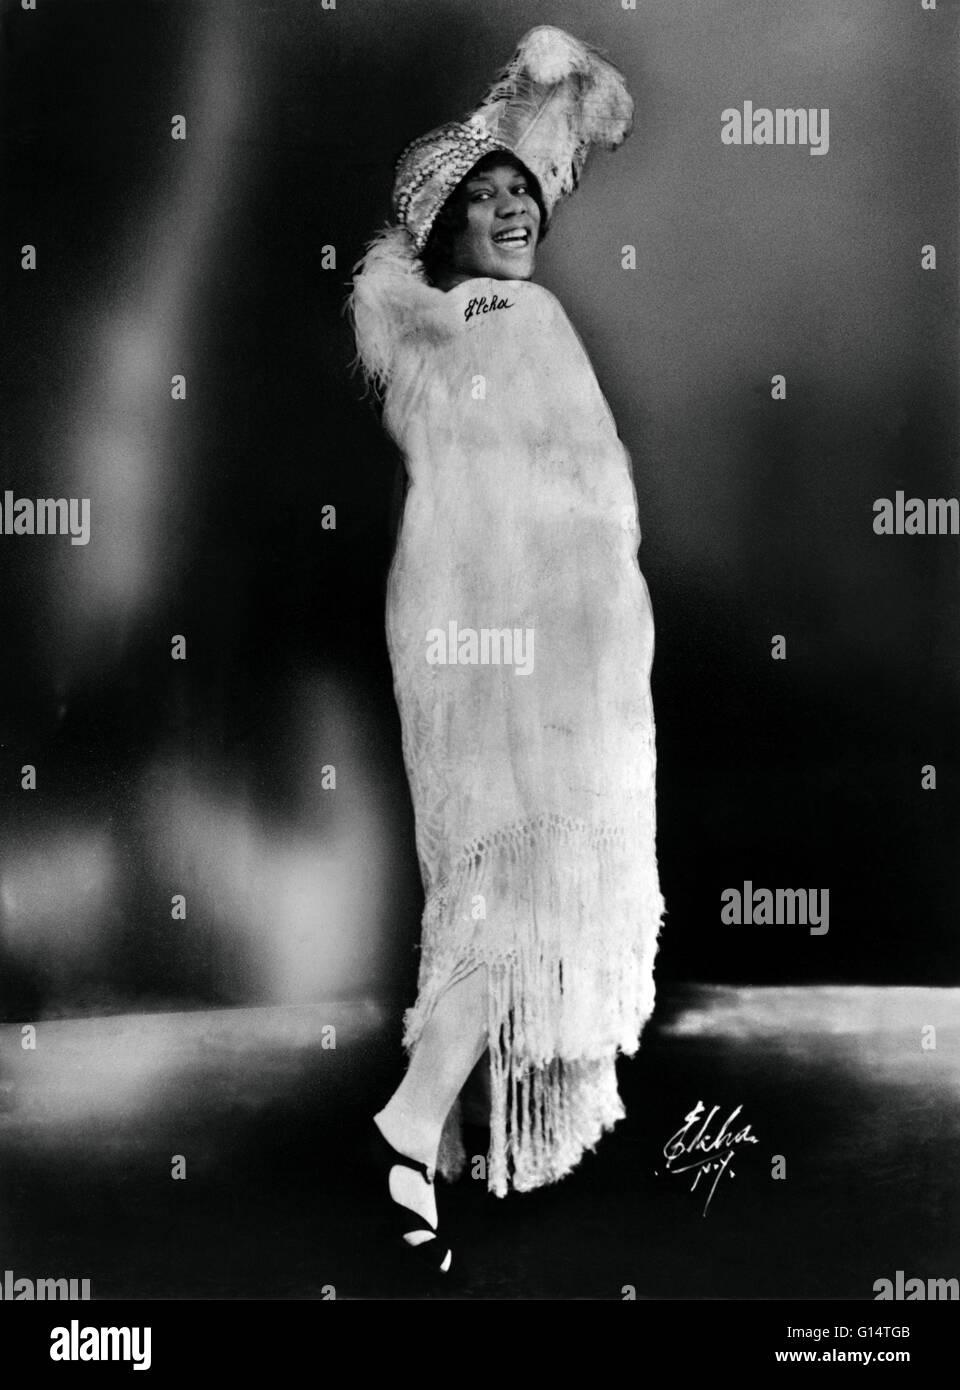 Blues Singers Stock Photos & Blues Singers Stock Images - Alamy